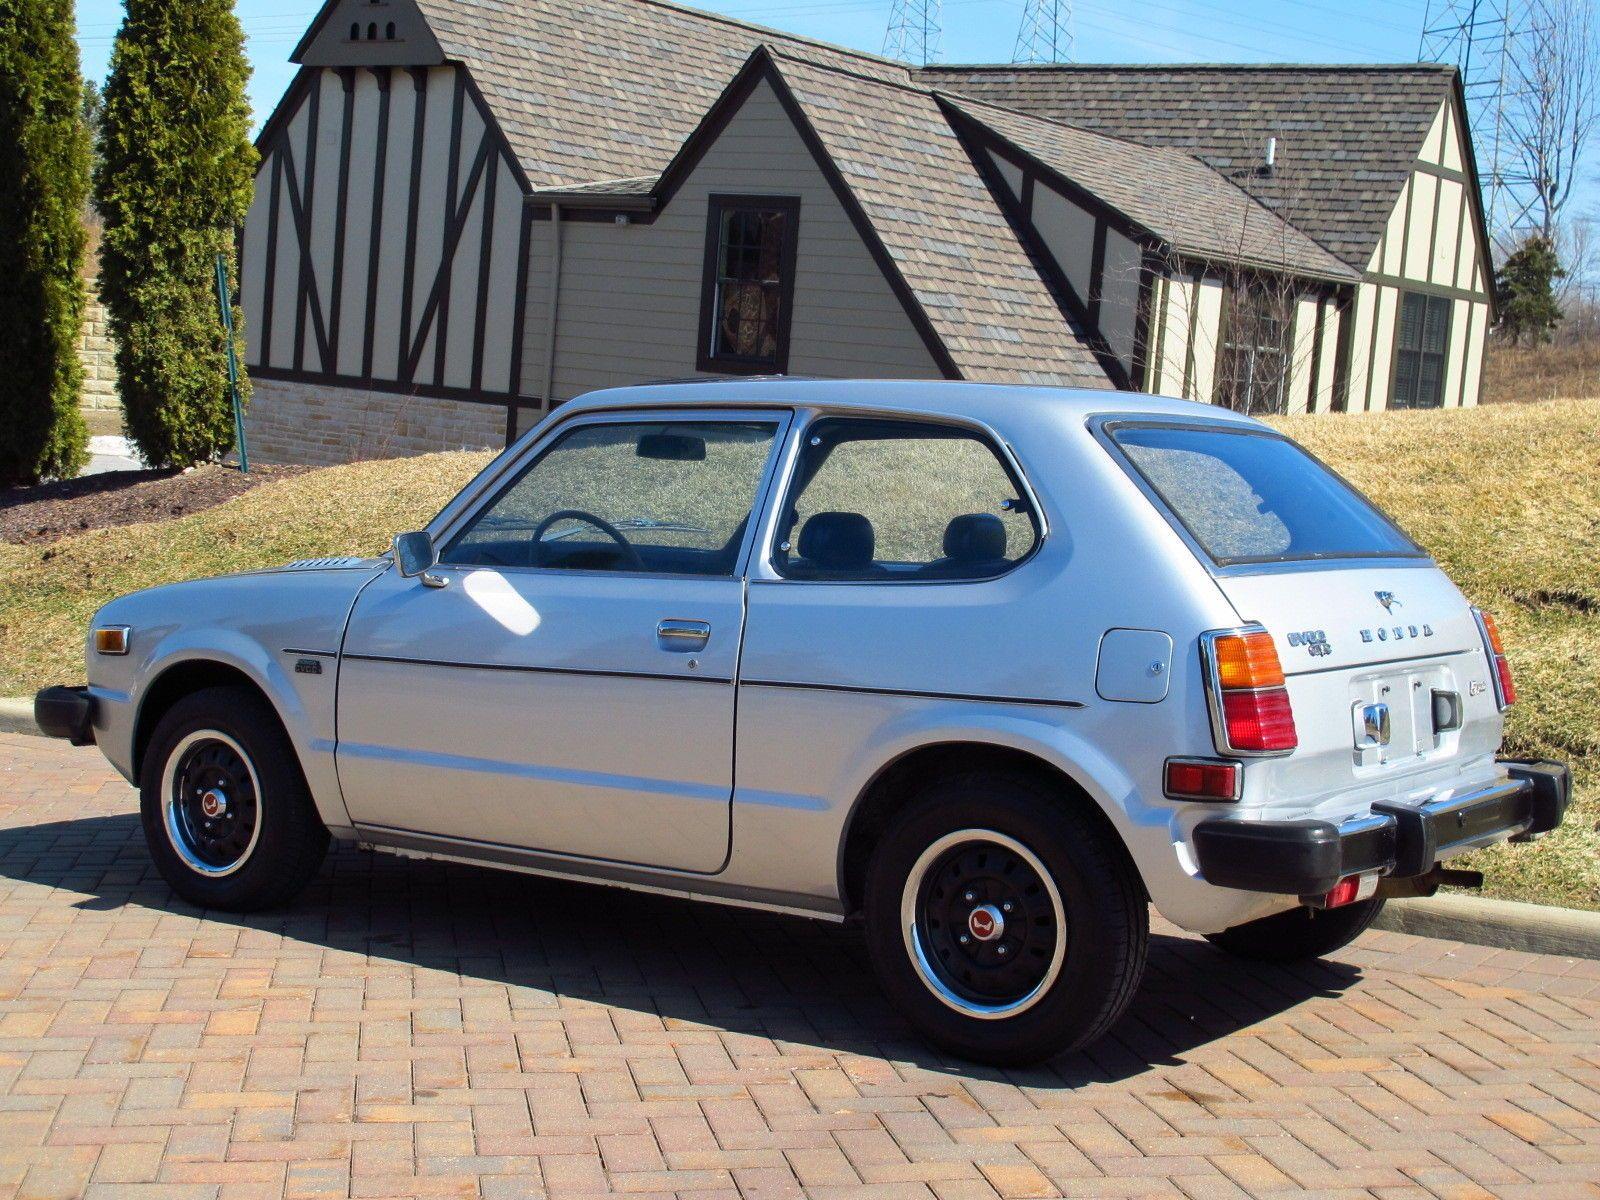 1978 Honda Civic CVCC 3-door hatchback with 72,169 miles.